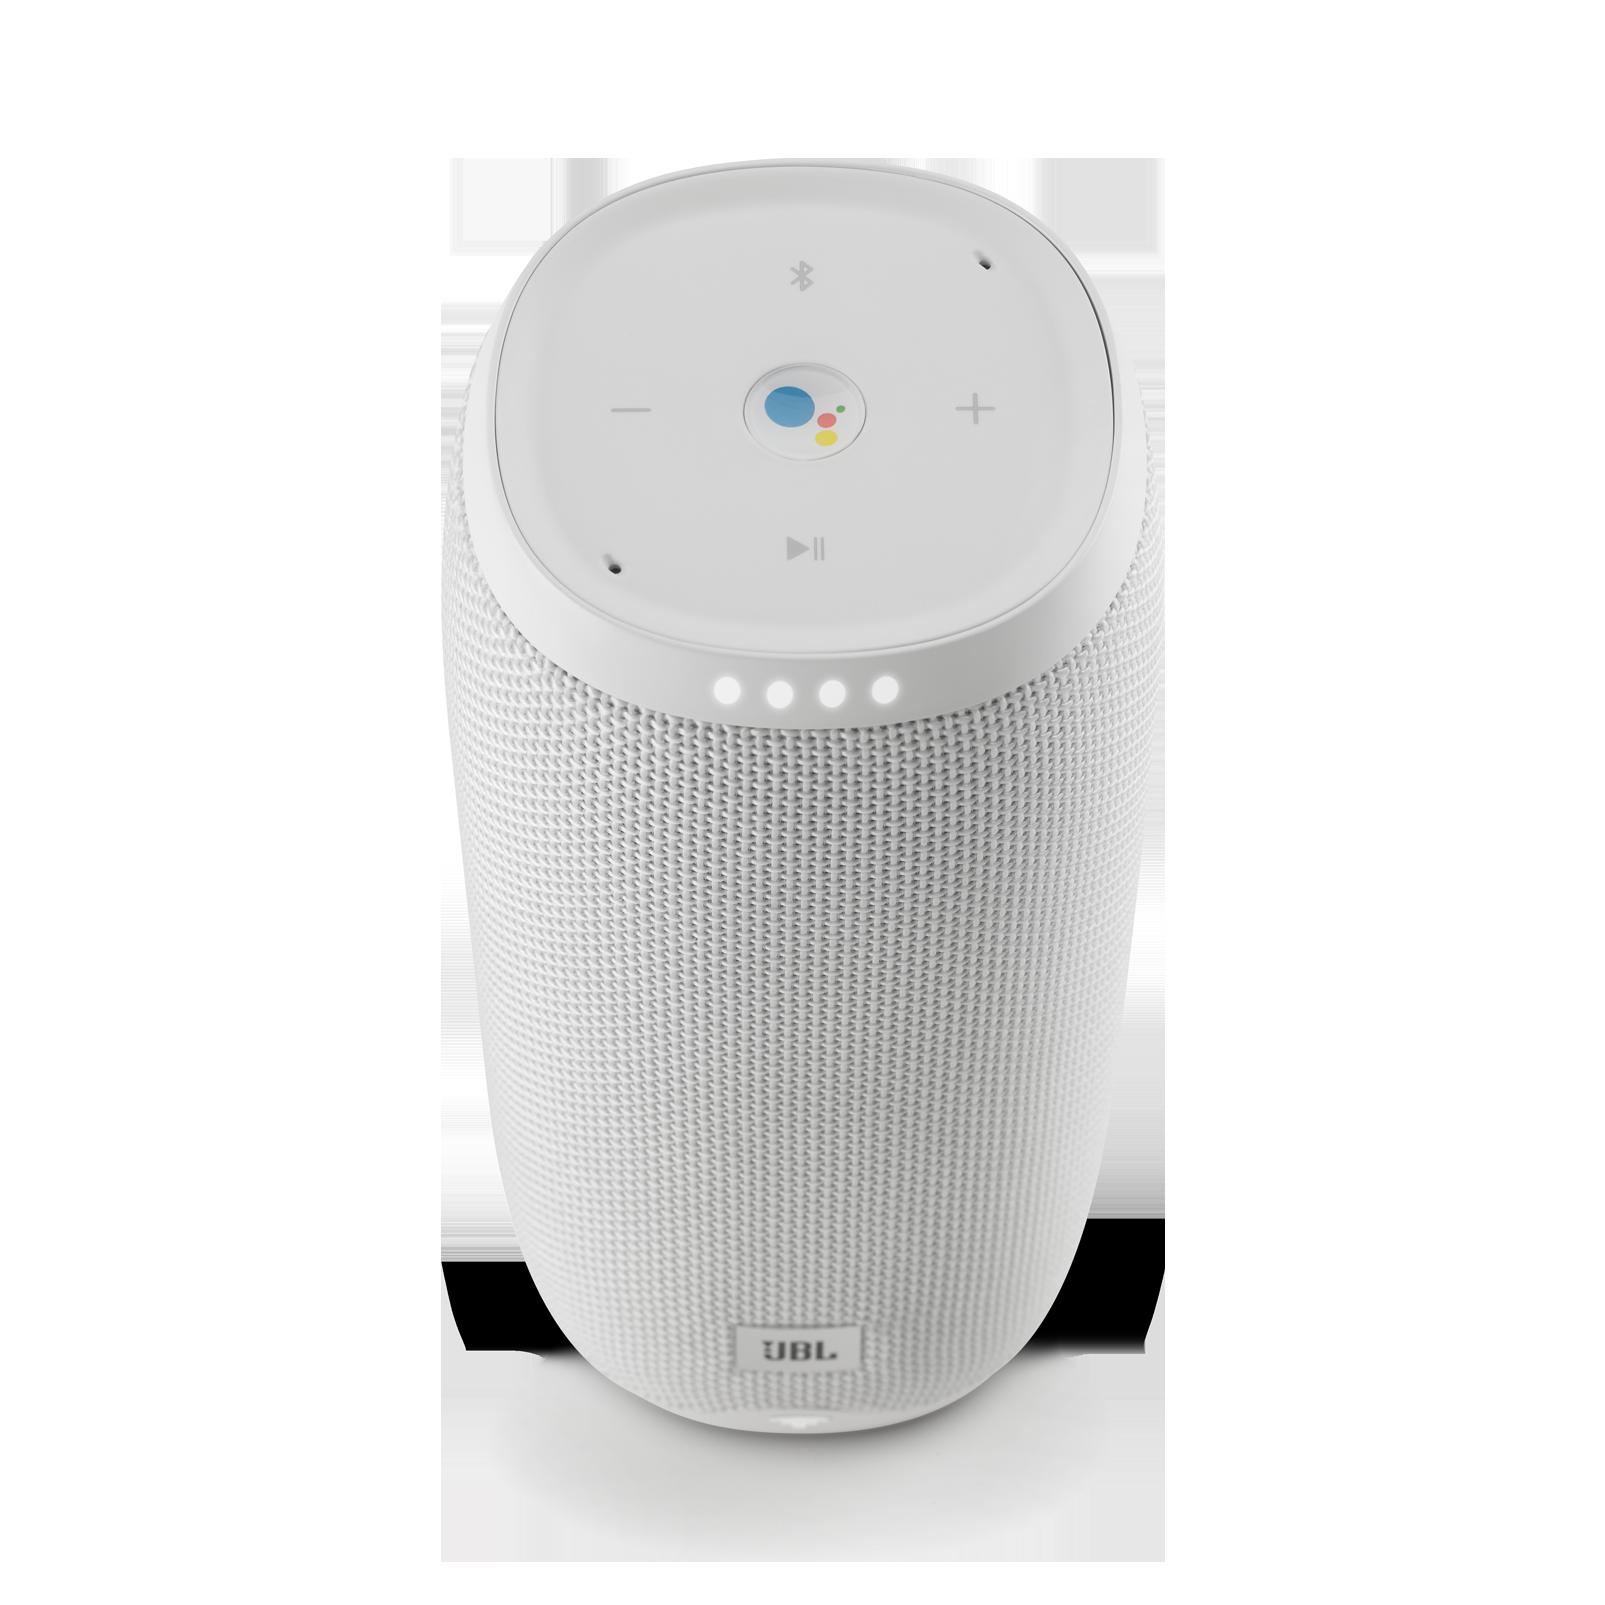 JBL Link 20 - White - Voice-activated portable speaker - Detailshot 1